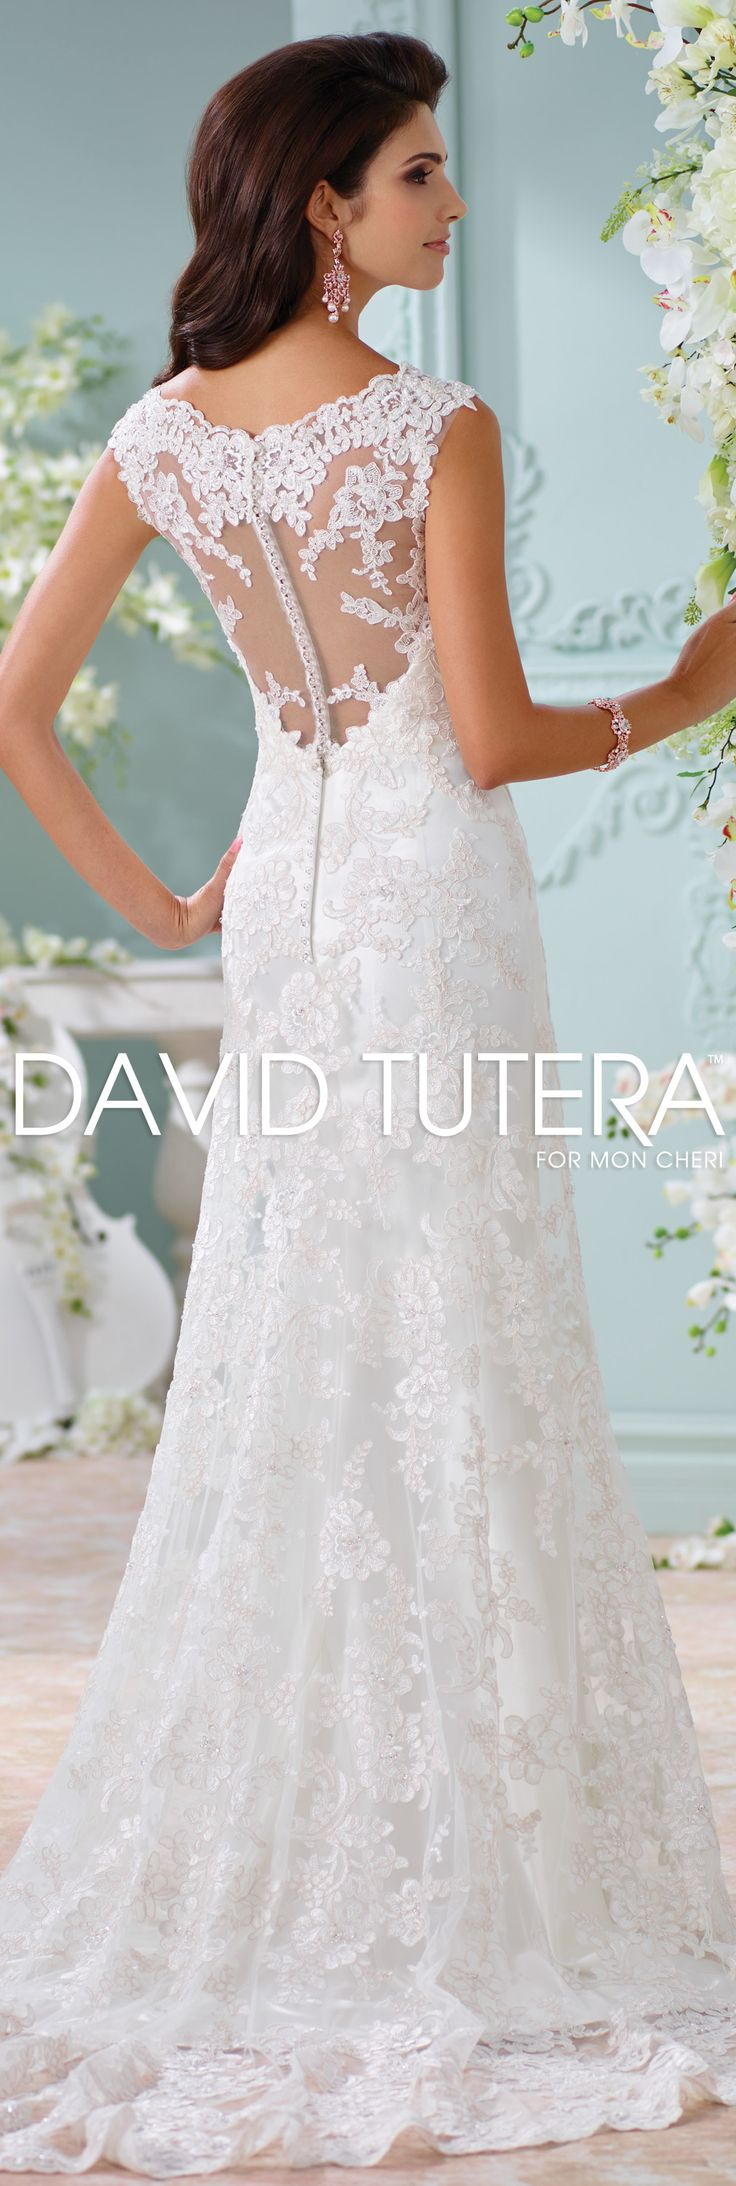 Wedding dresses u spring david tutera gowns and weddings